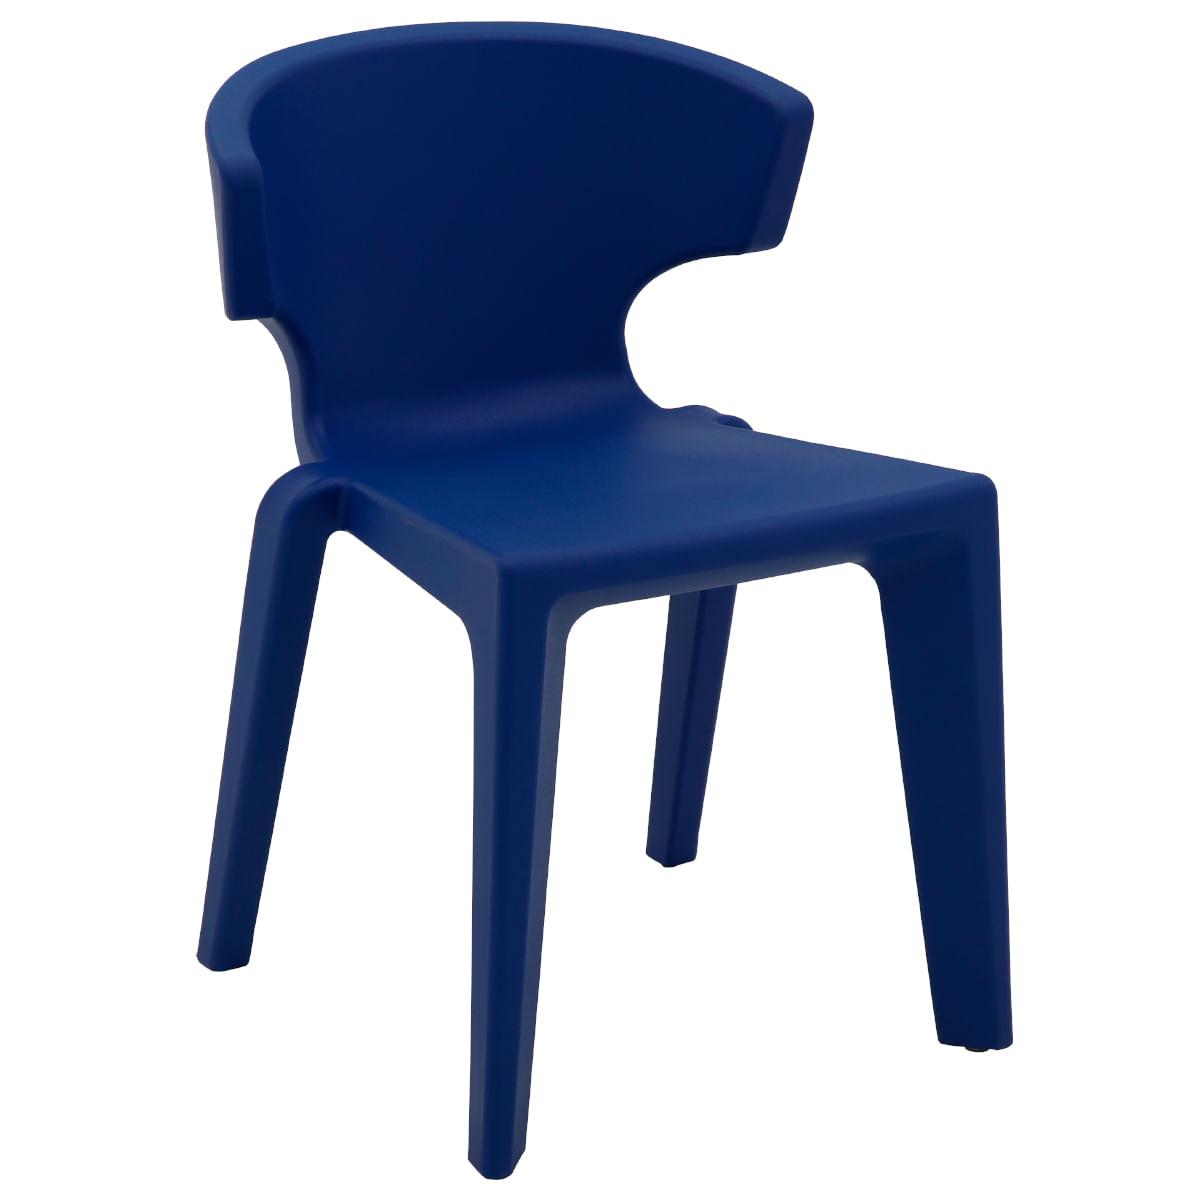 Cadeira Tramontina Marylin em Polietileno Mariner